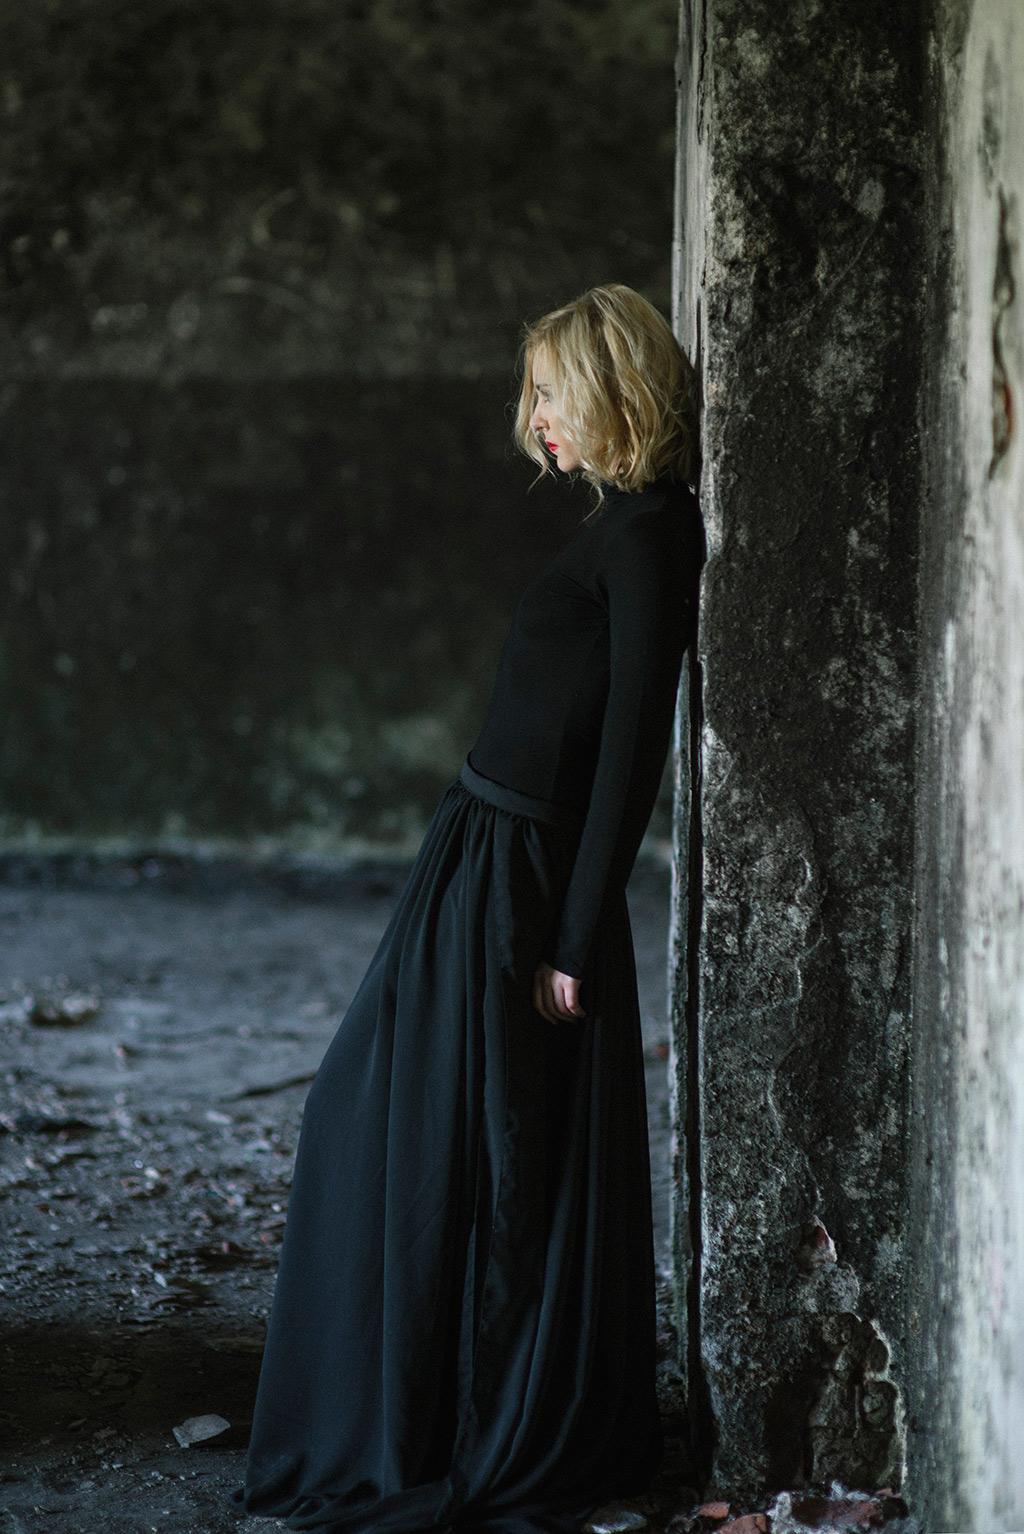 Lina-Aiduke-Photography-Blog---Daine---001b